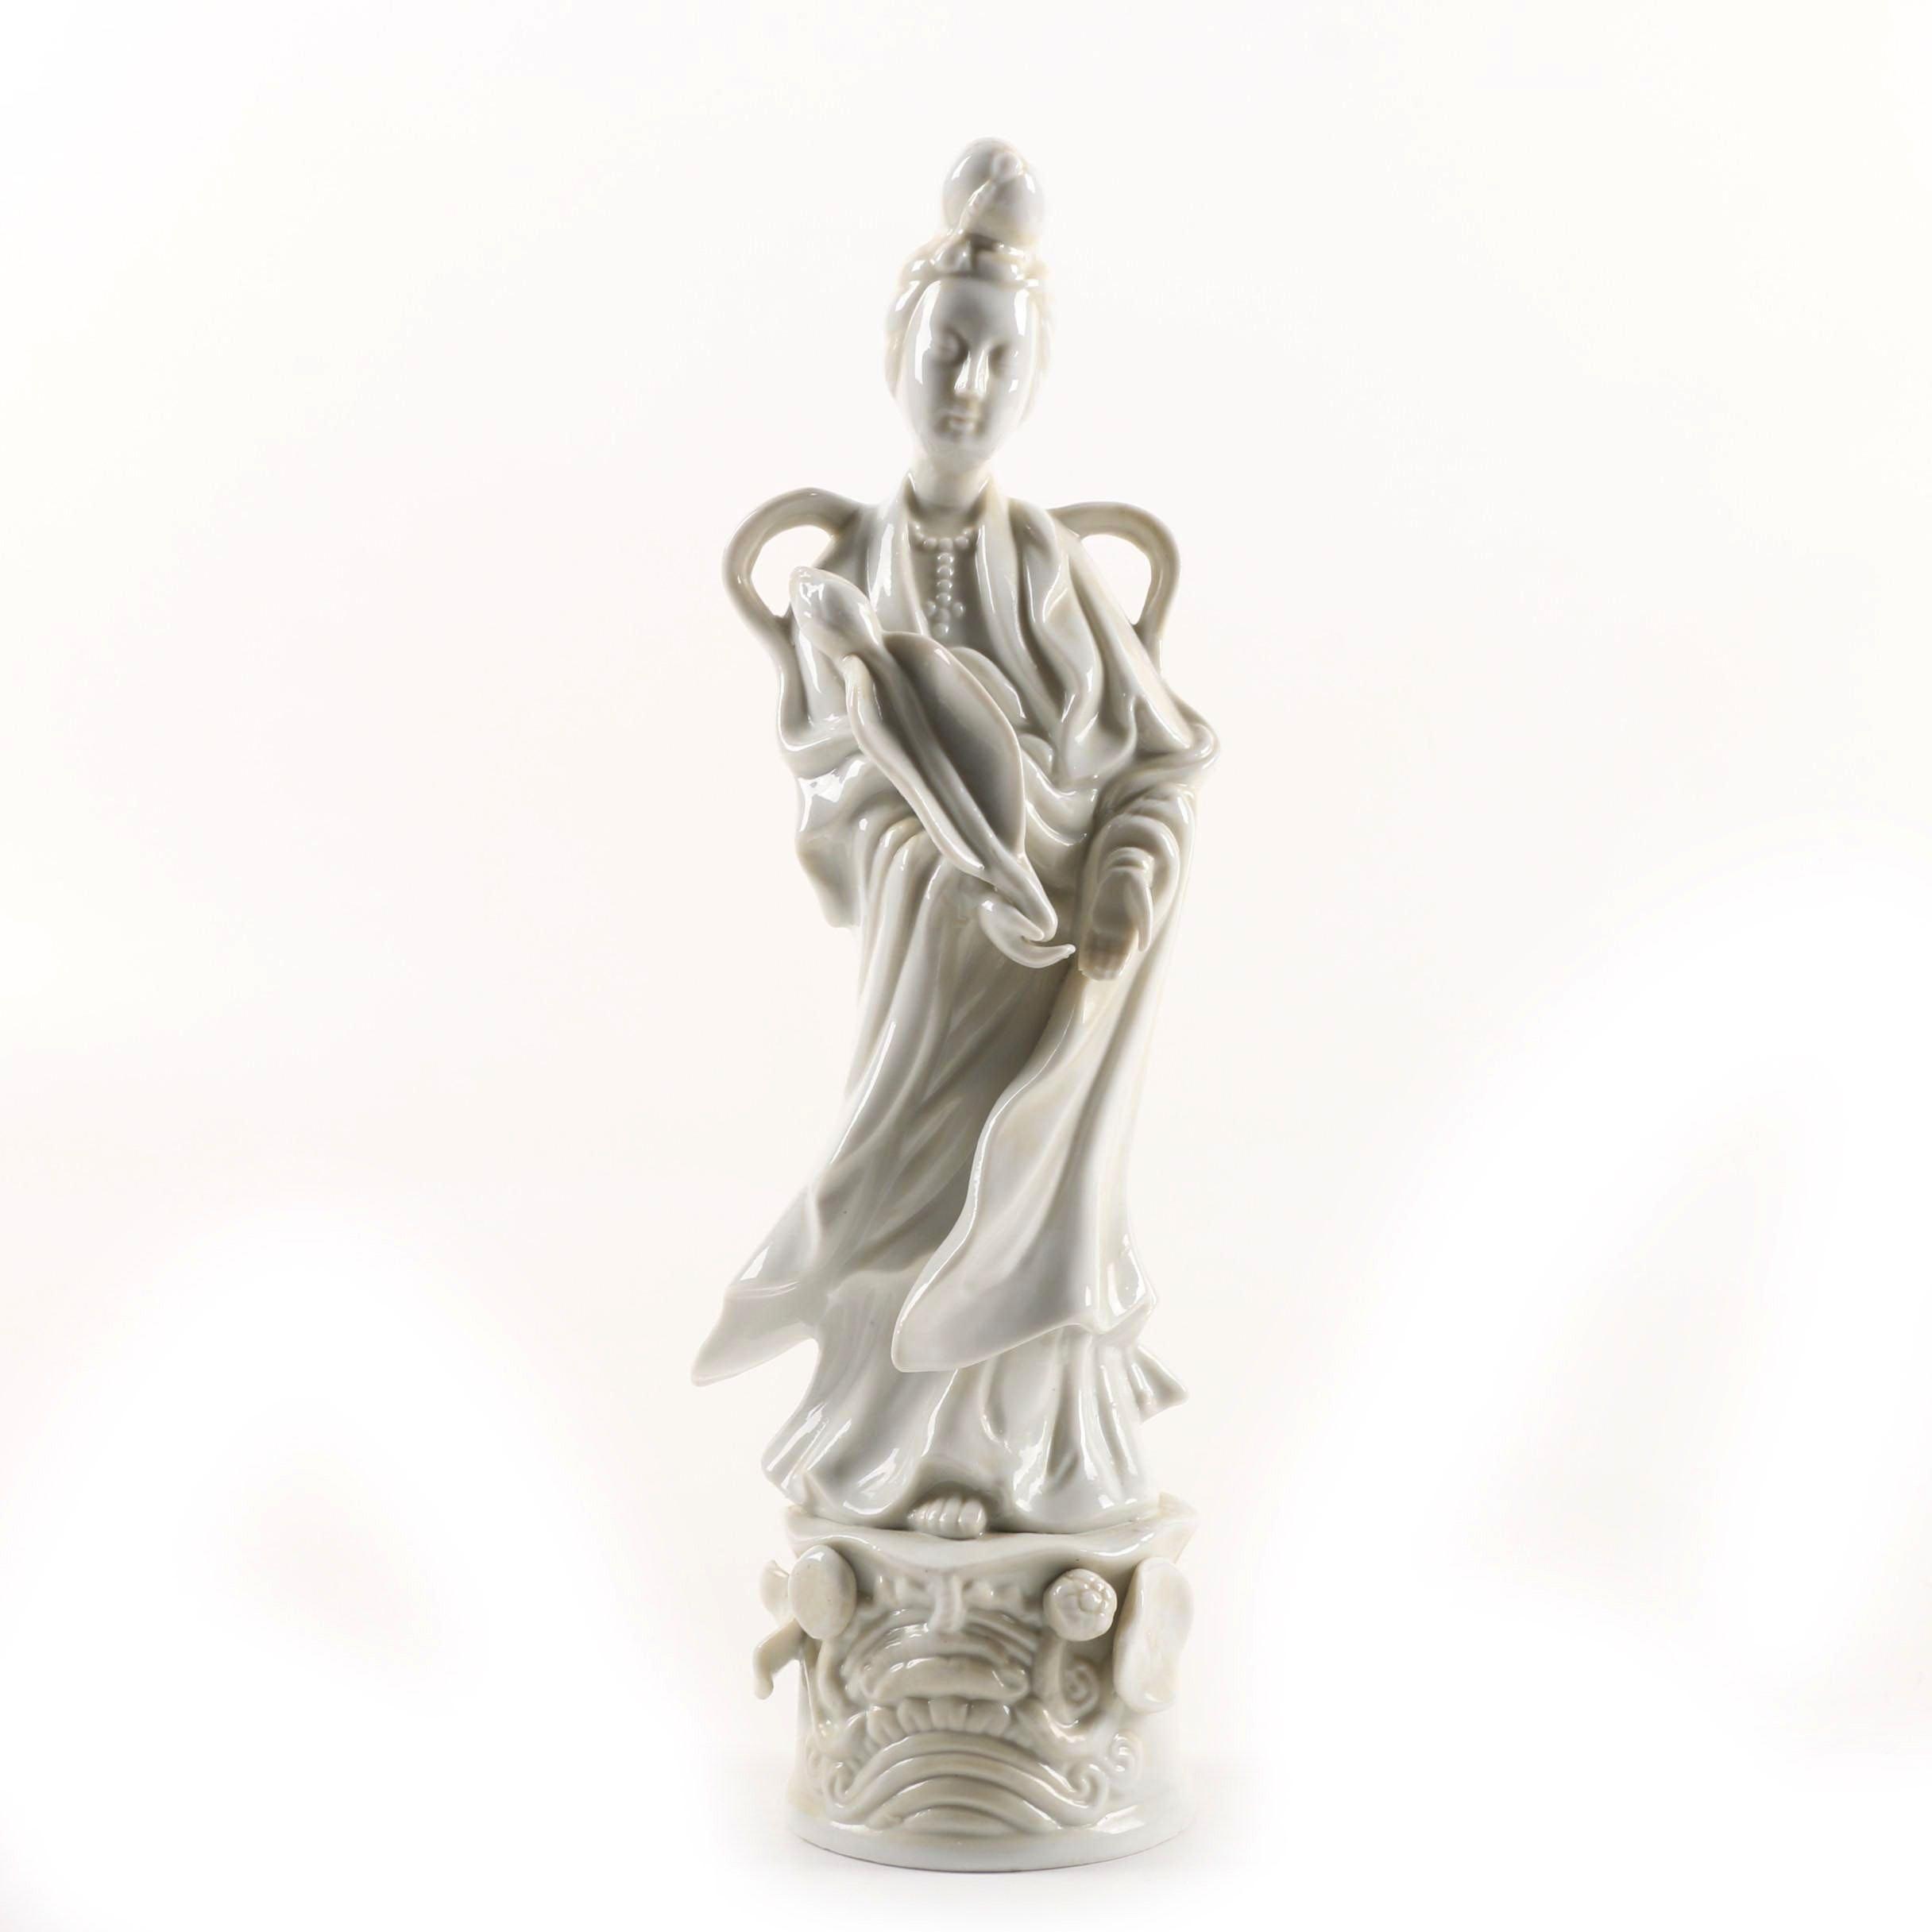 Vintage HOMCO Blanc de Chine Figurine